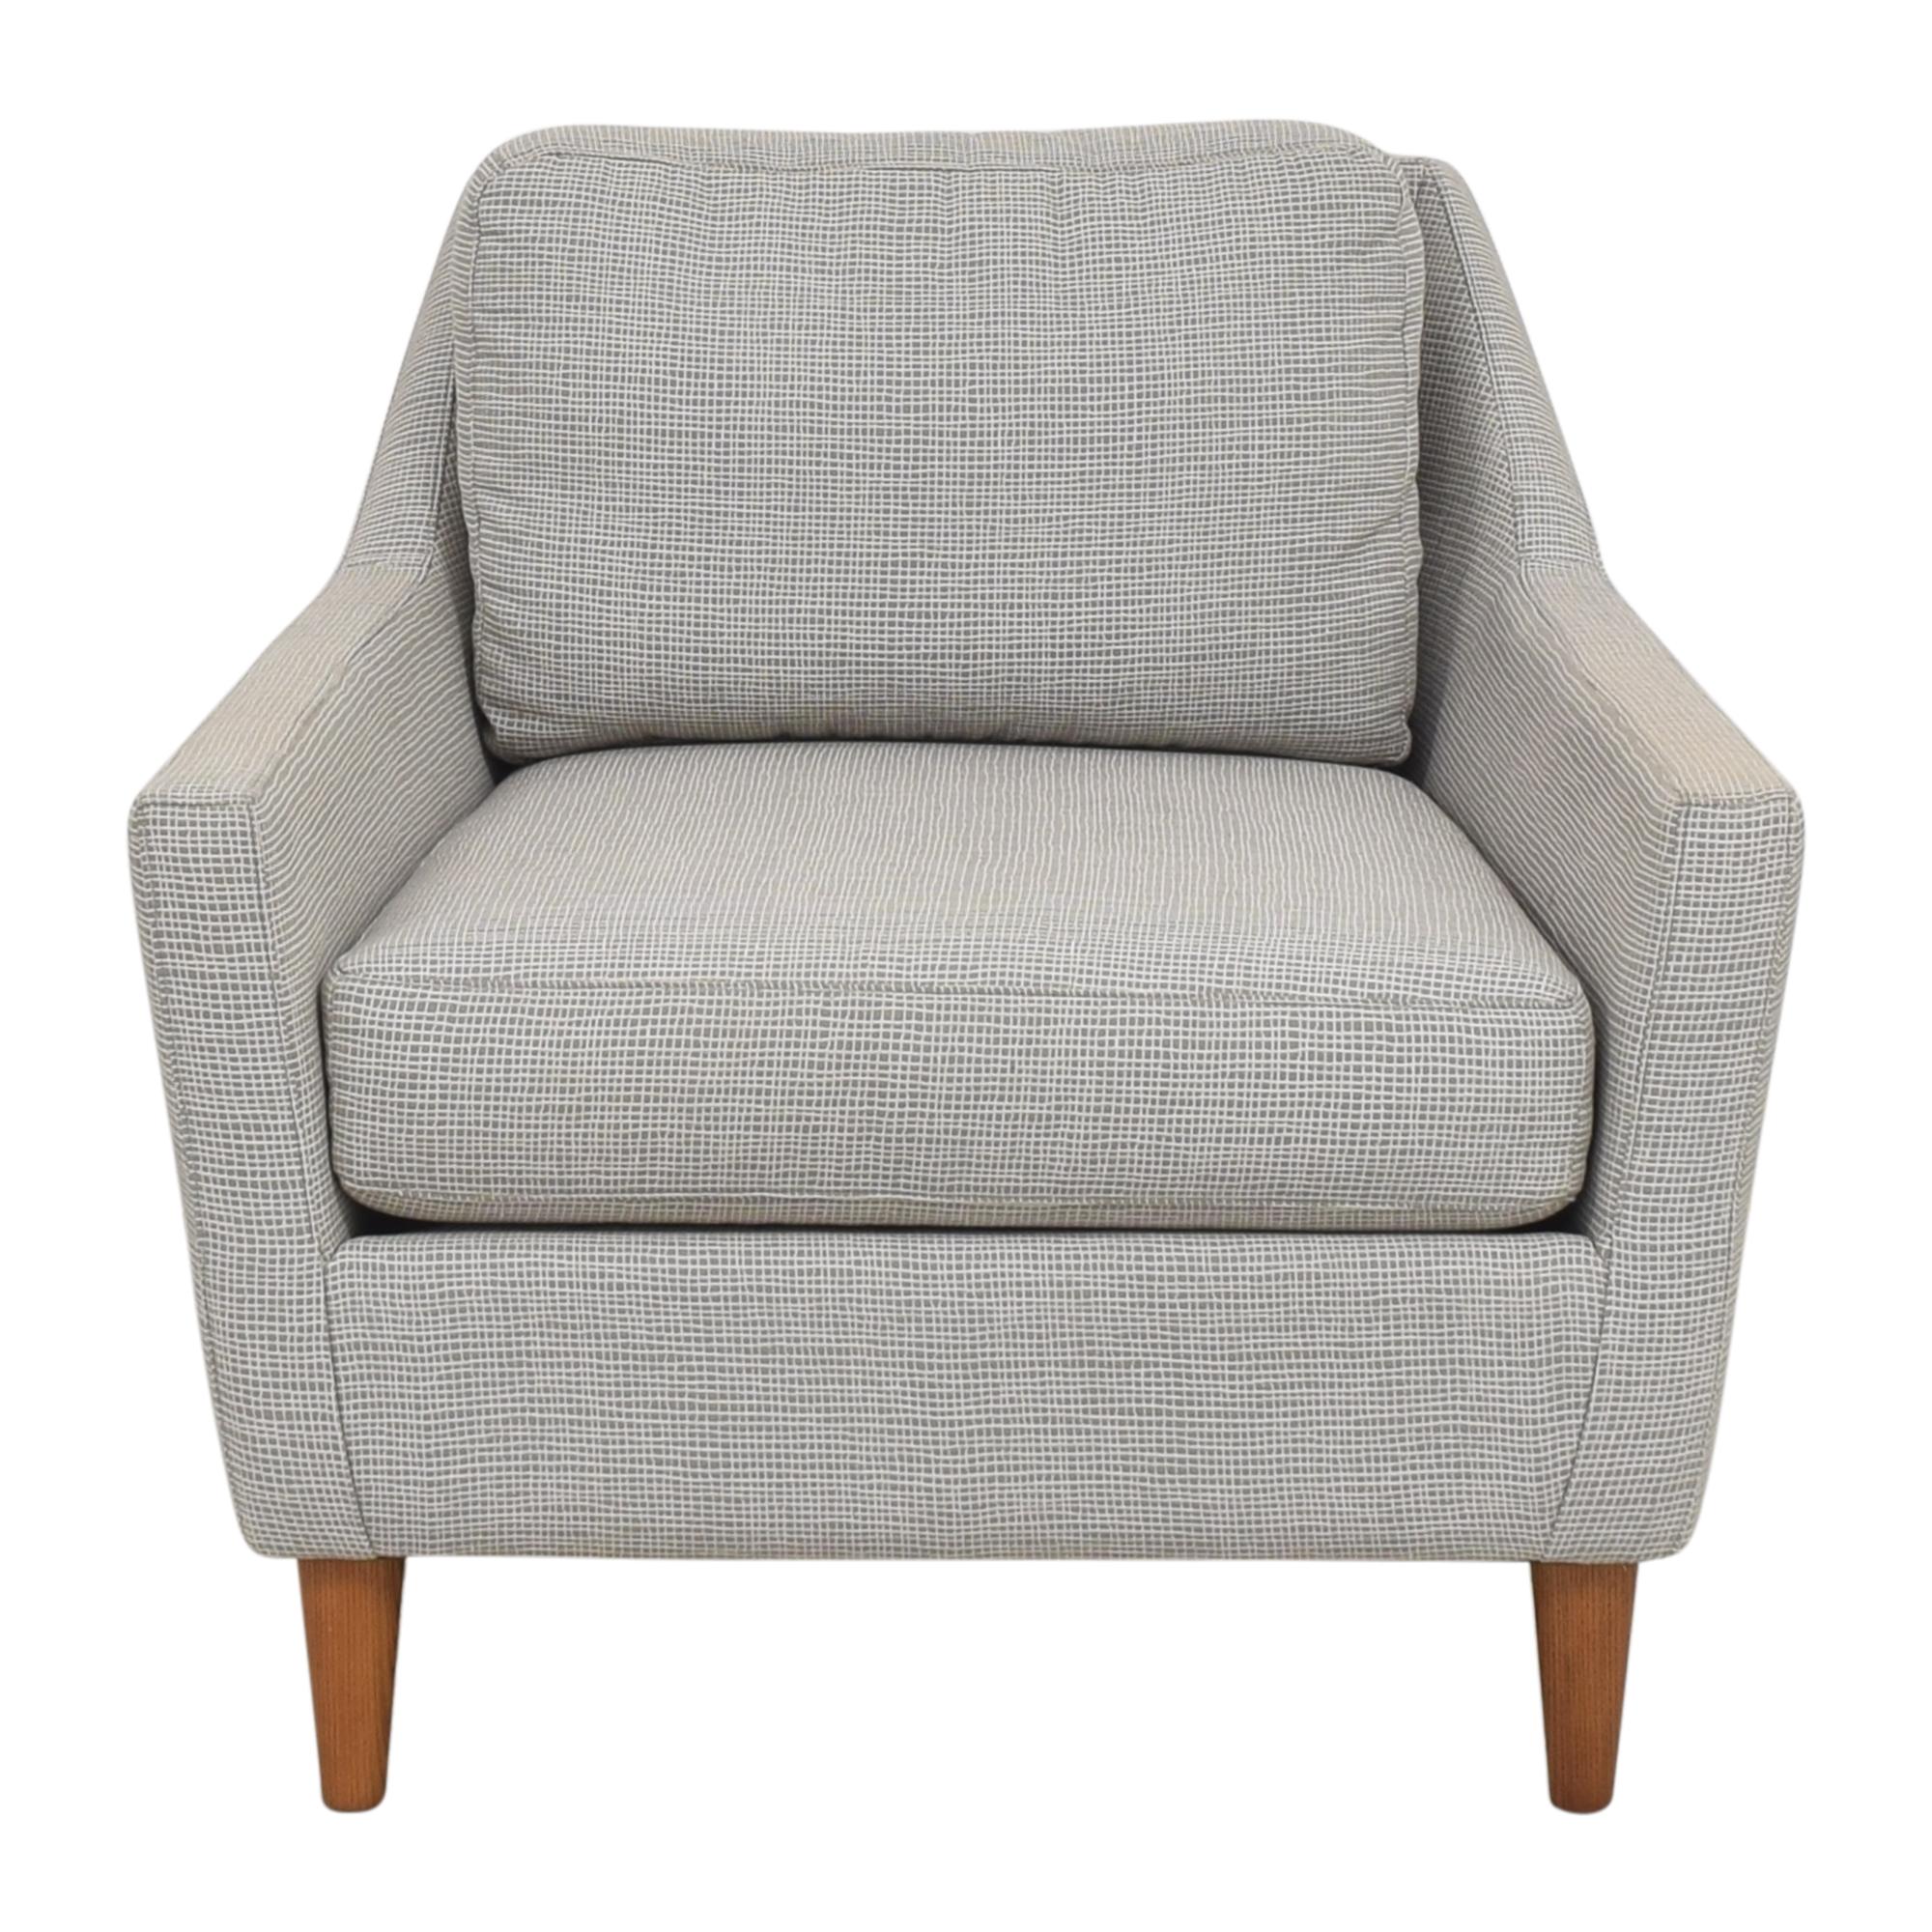 West Elm West Elm Everett Chair on sale